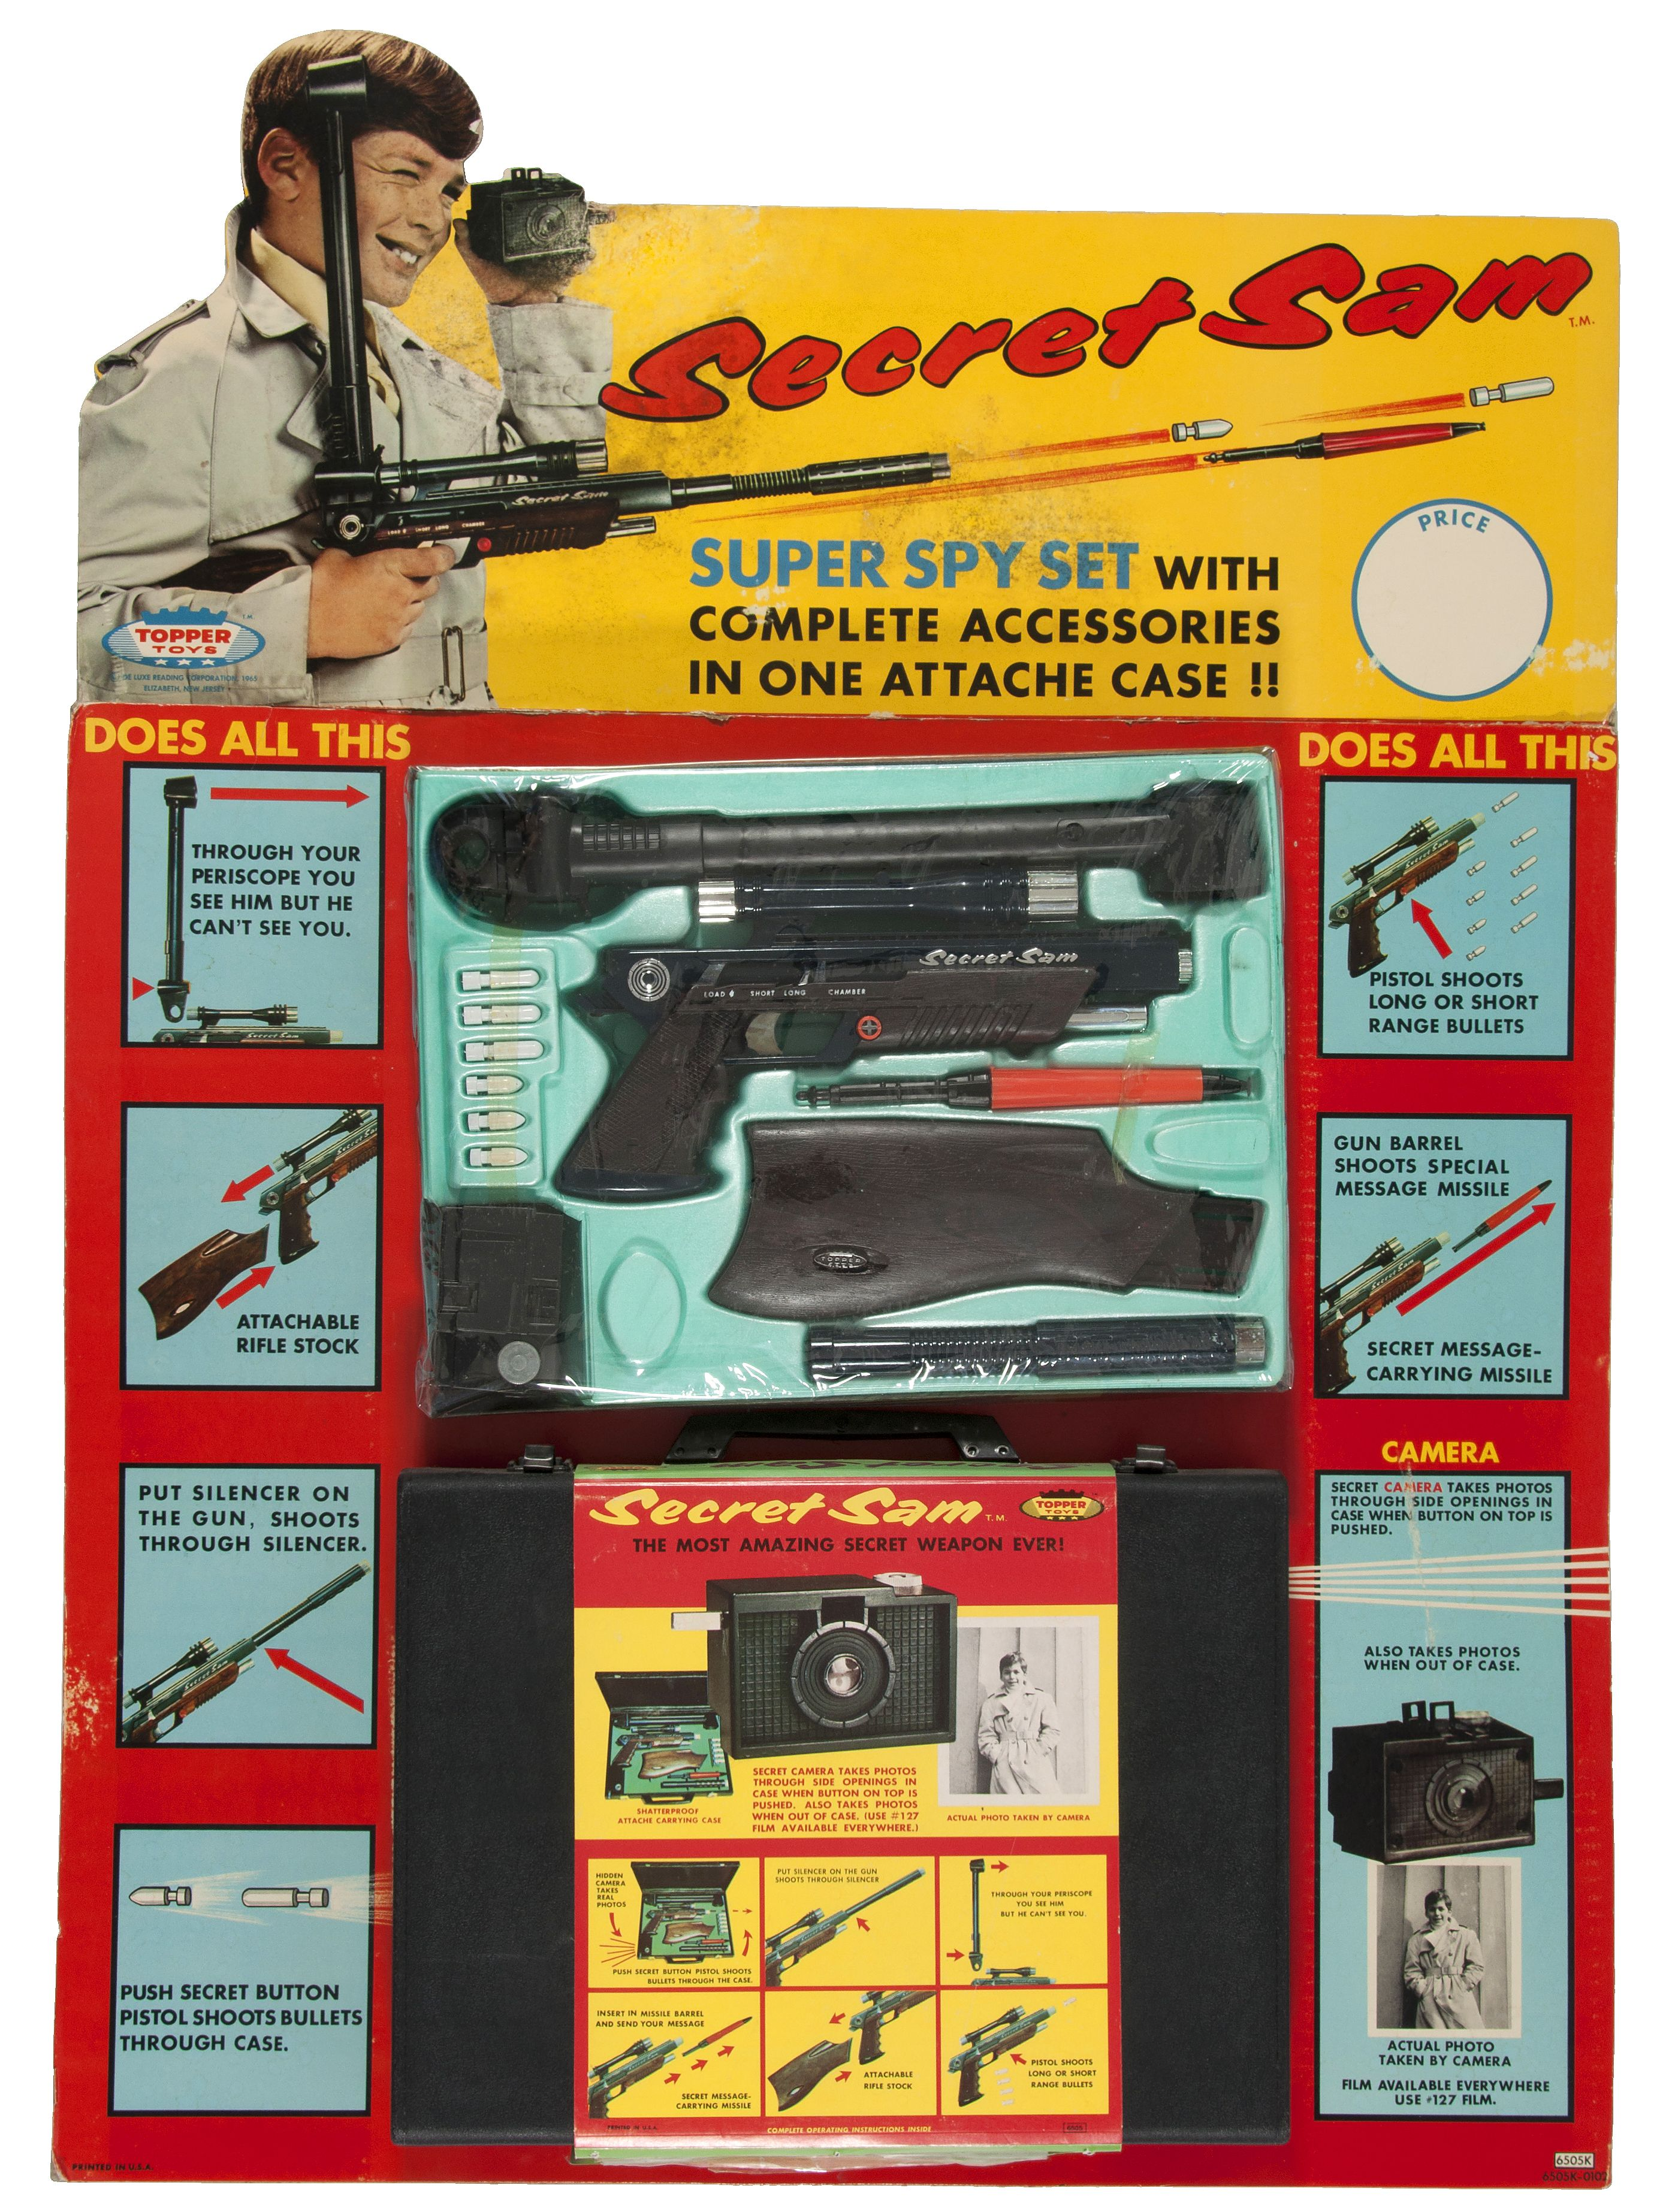 Secret Sam spy attache case store display 1965 By Topper